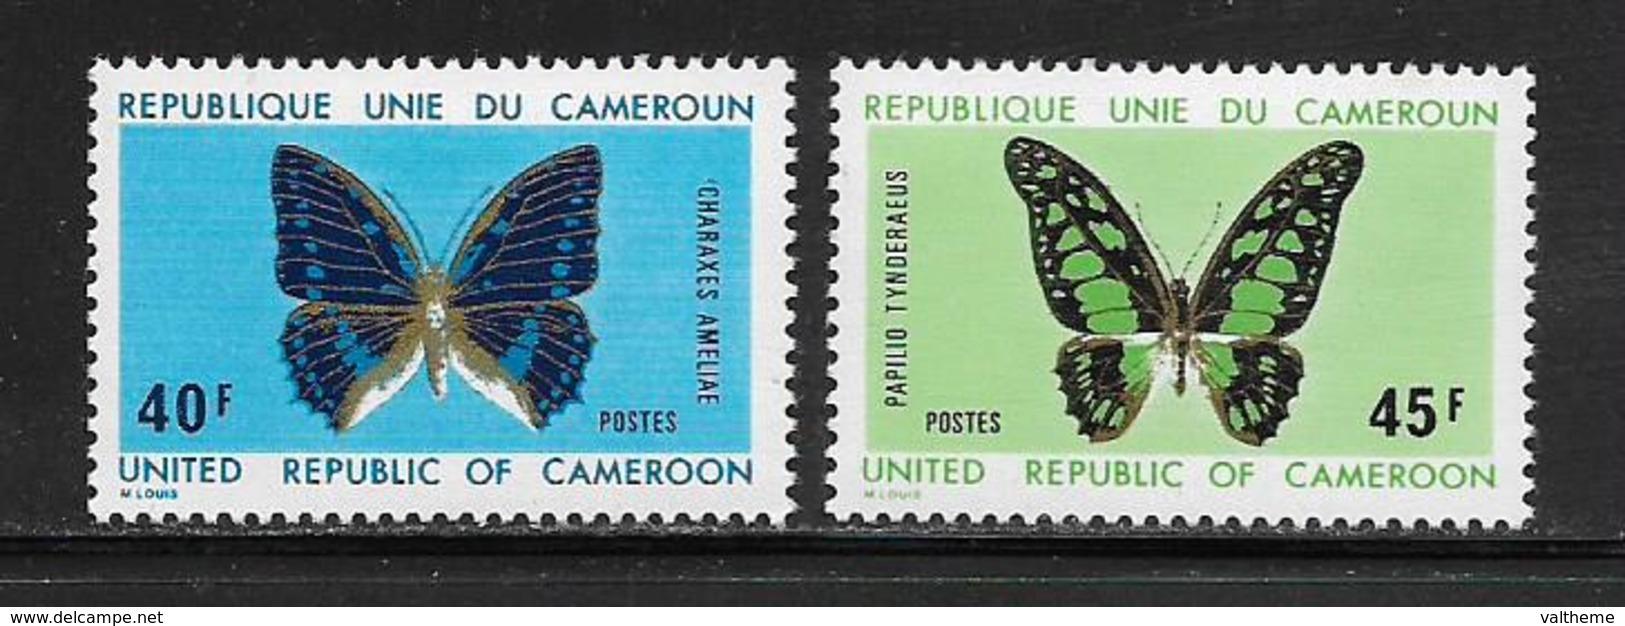 CAMEROUN  ( AFCA - 81 )  1972  N° YVERT ET TELLIER   N° 528/529   N** - Cameroun (1960-...)